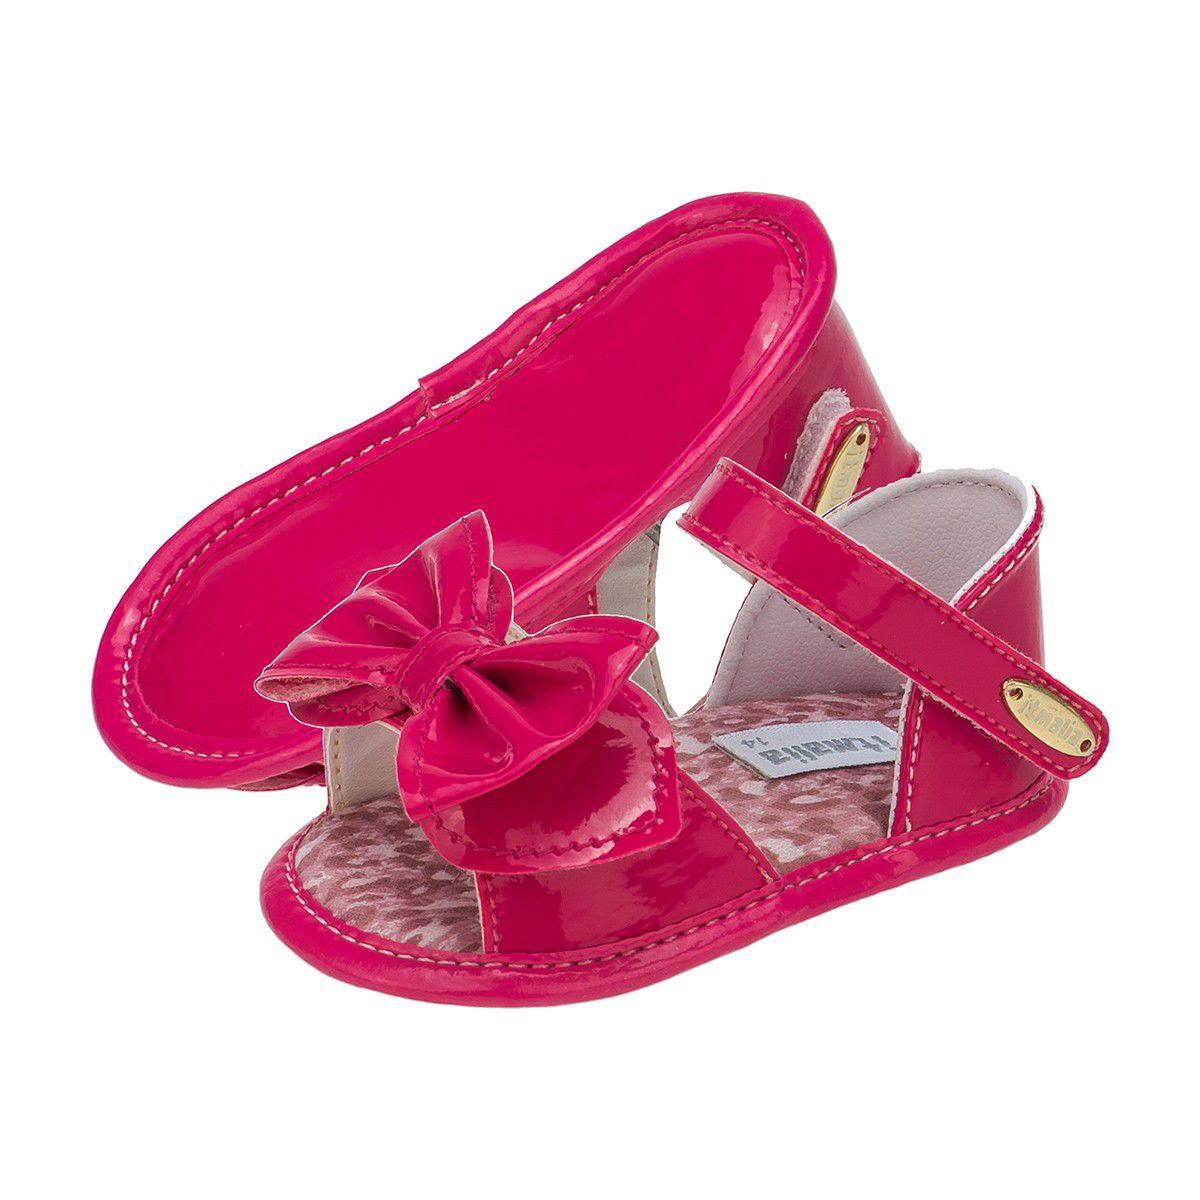 Sandália Bebê Menina Pink com Laço - Itmalia